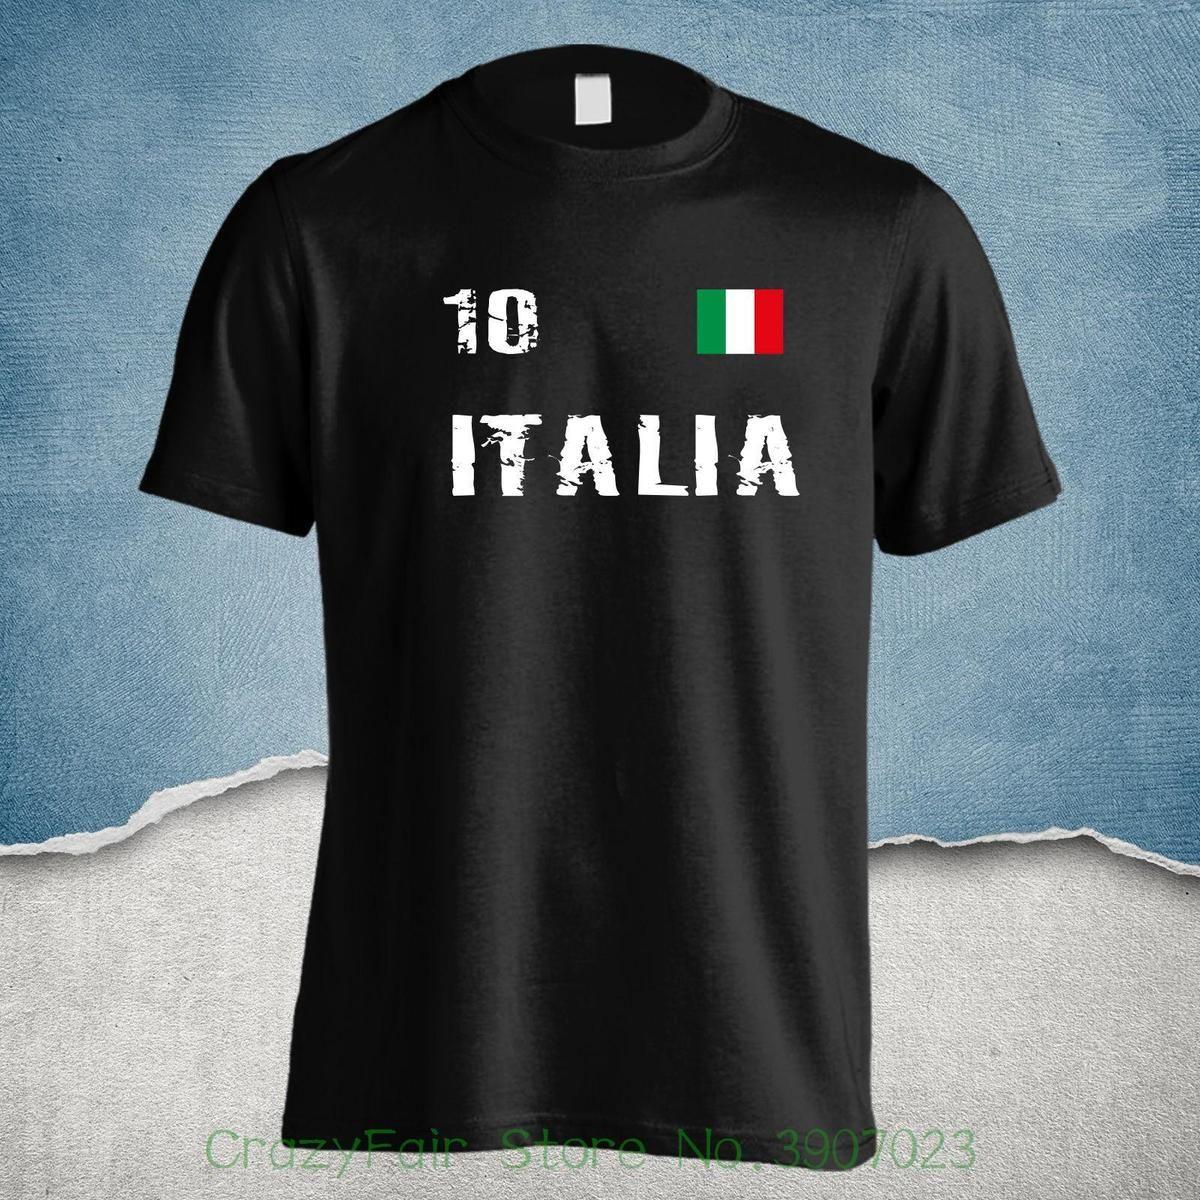 ff0e8bf3c5 Italia T Shirt Italien Squadra Azzurra Hochwertige Verarbeitung S 4xl Rom  Print Round Neck Man 10 T Shirts Cool Shirts Designs From Jie029